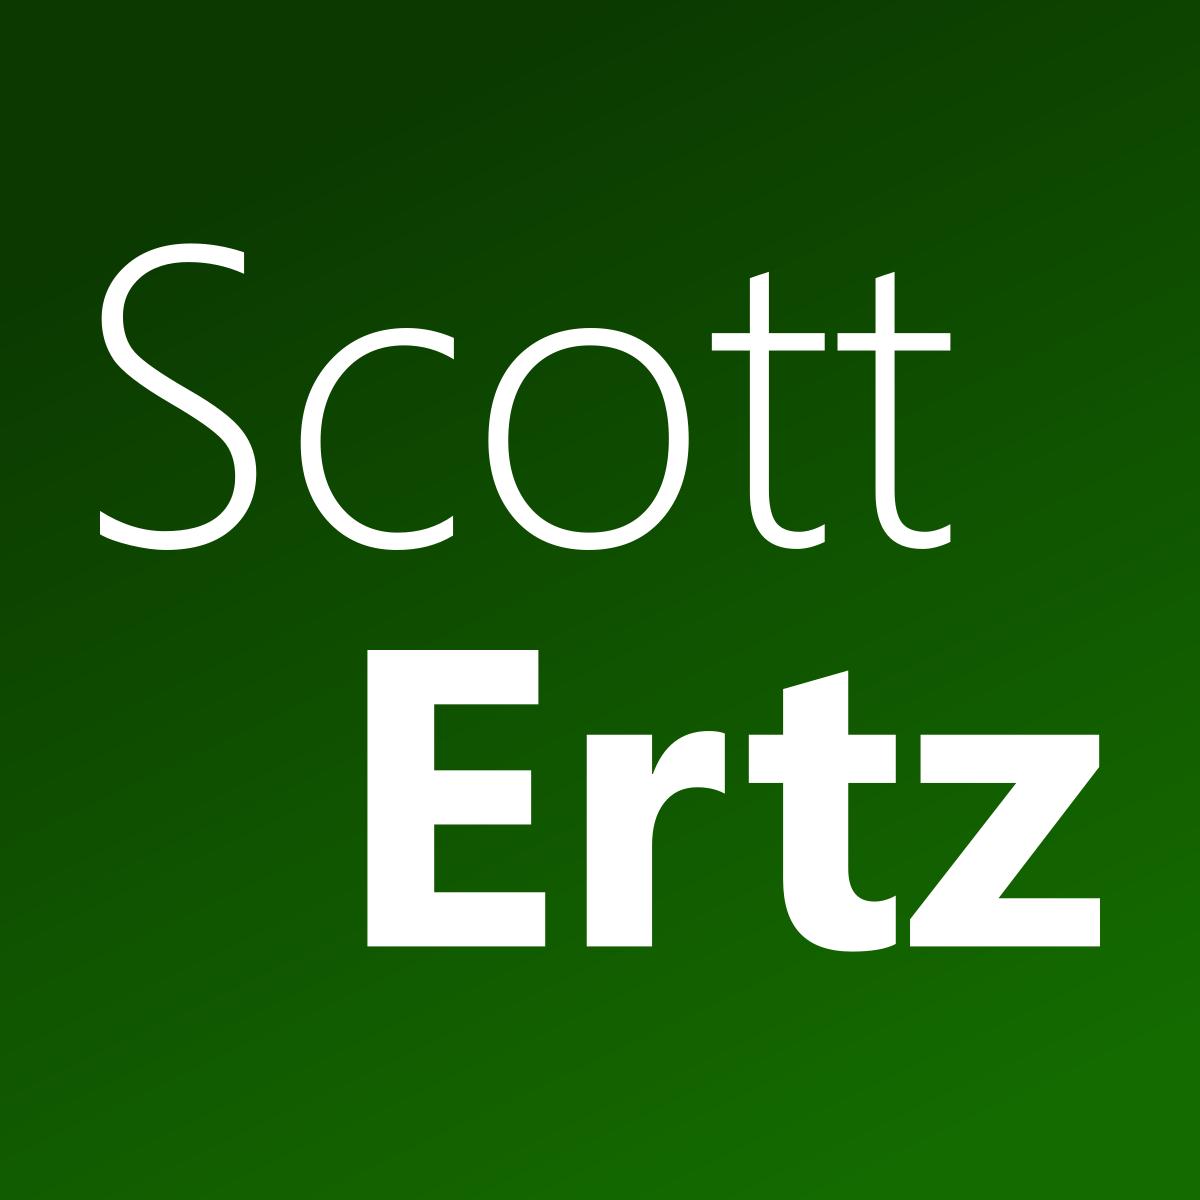 Scott Ertz